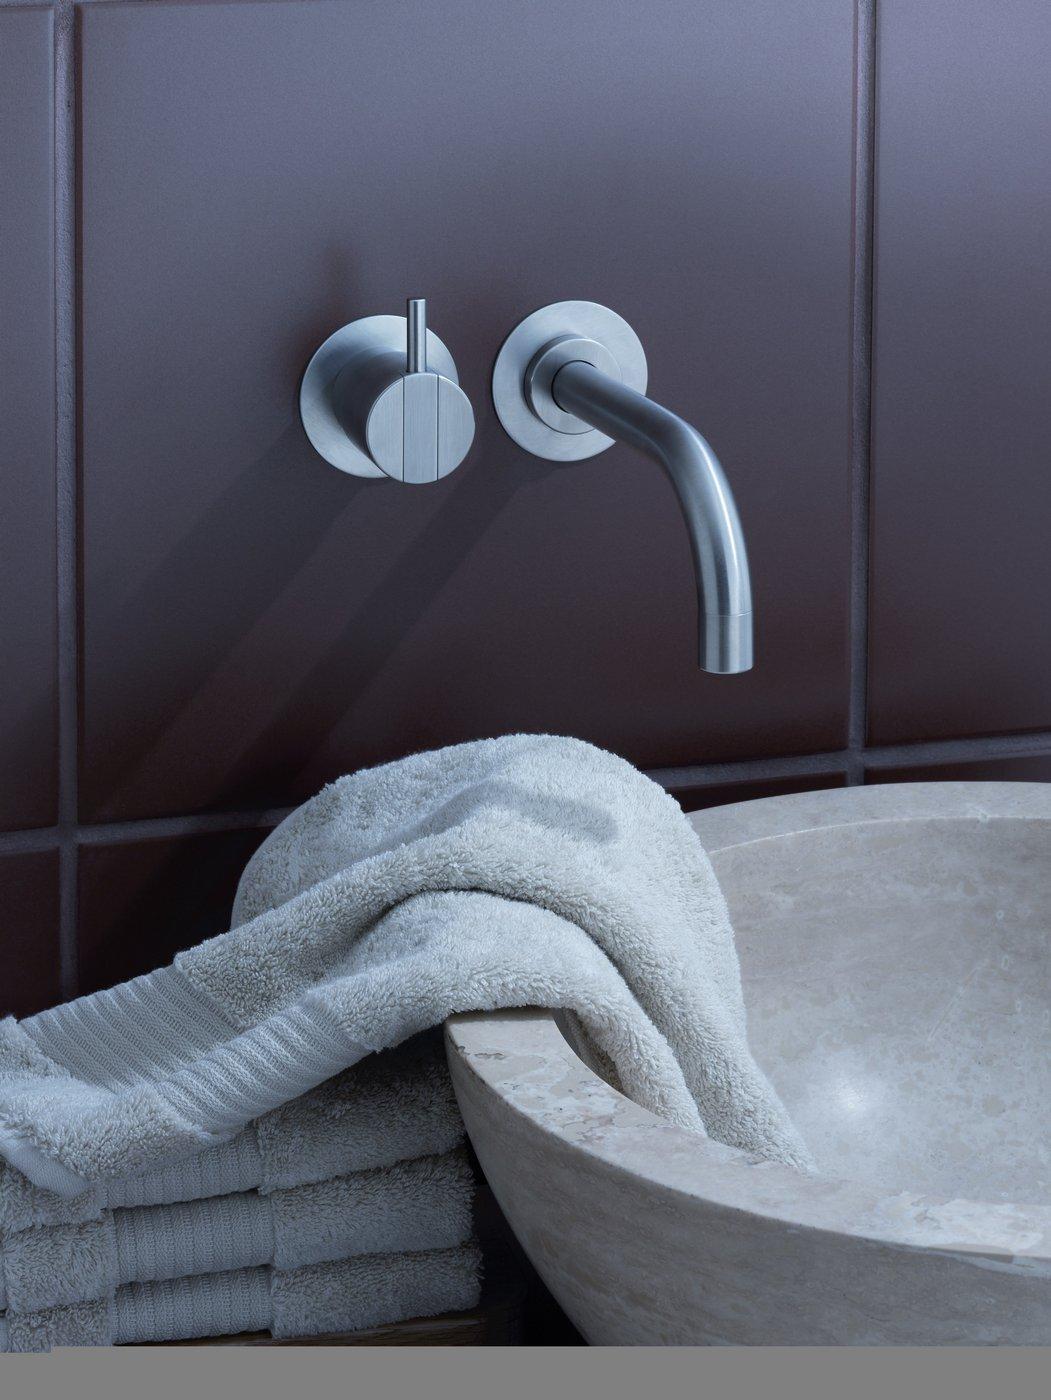 scholtes fliesen sanit r armaturen. Black Bedroom Furniture Sets. Home Design Ideas